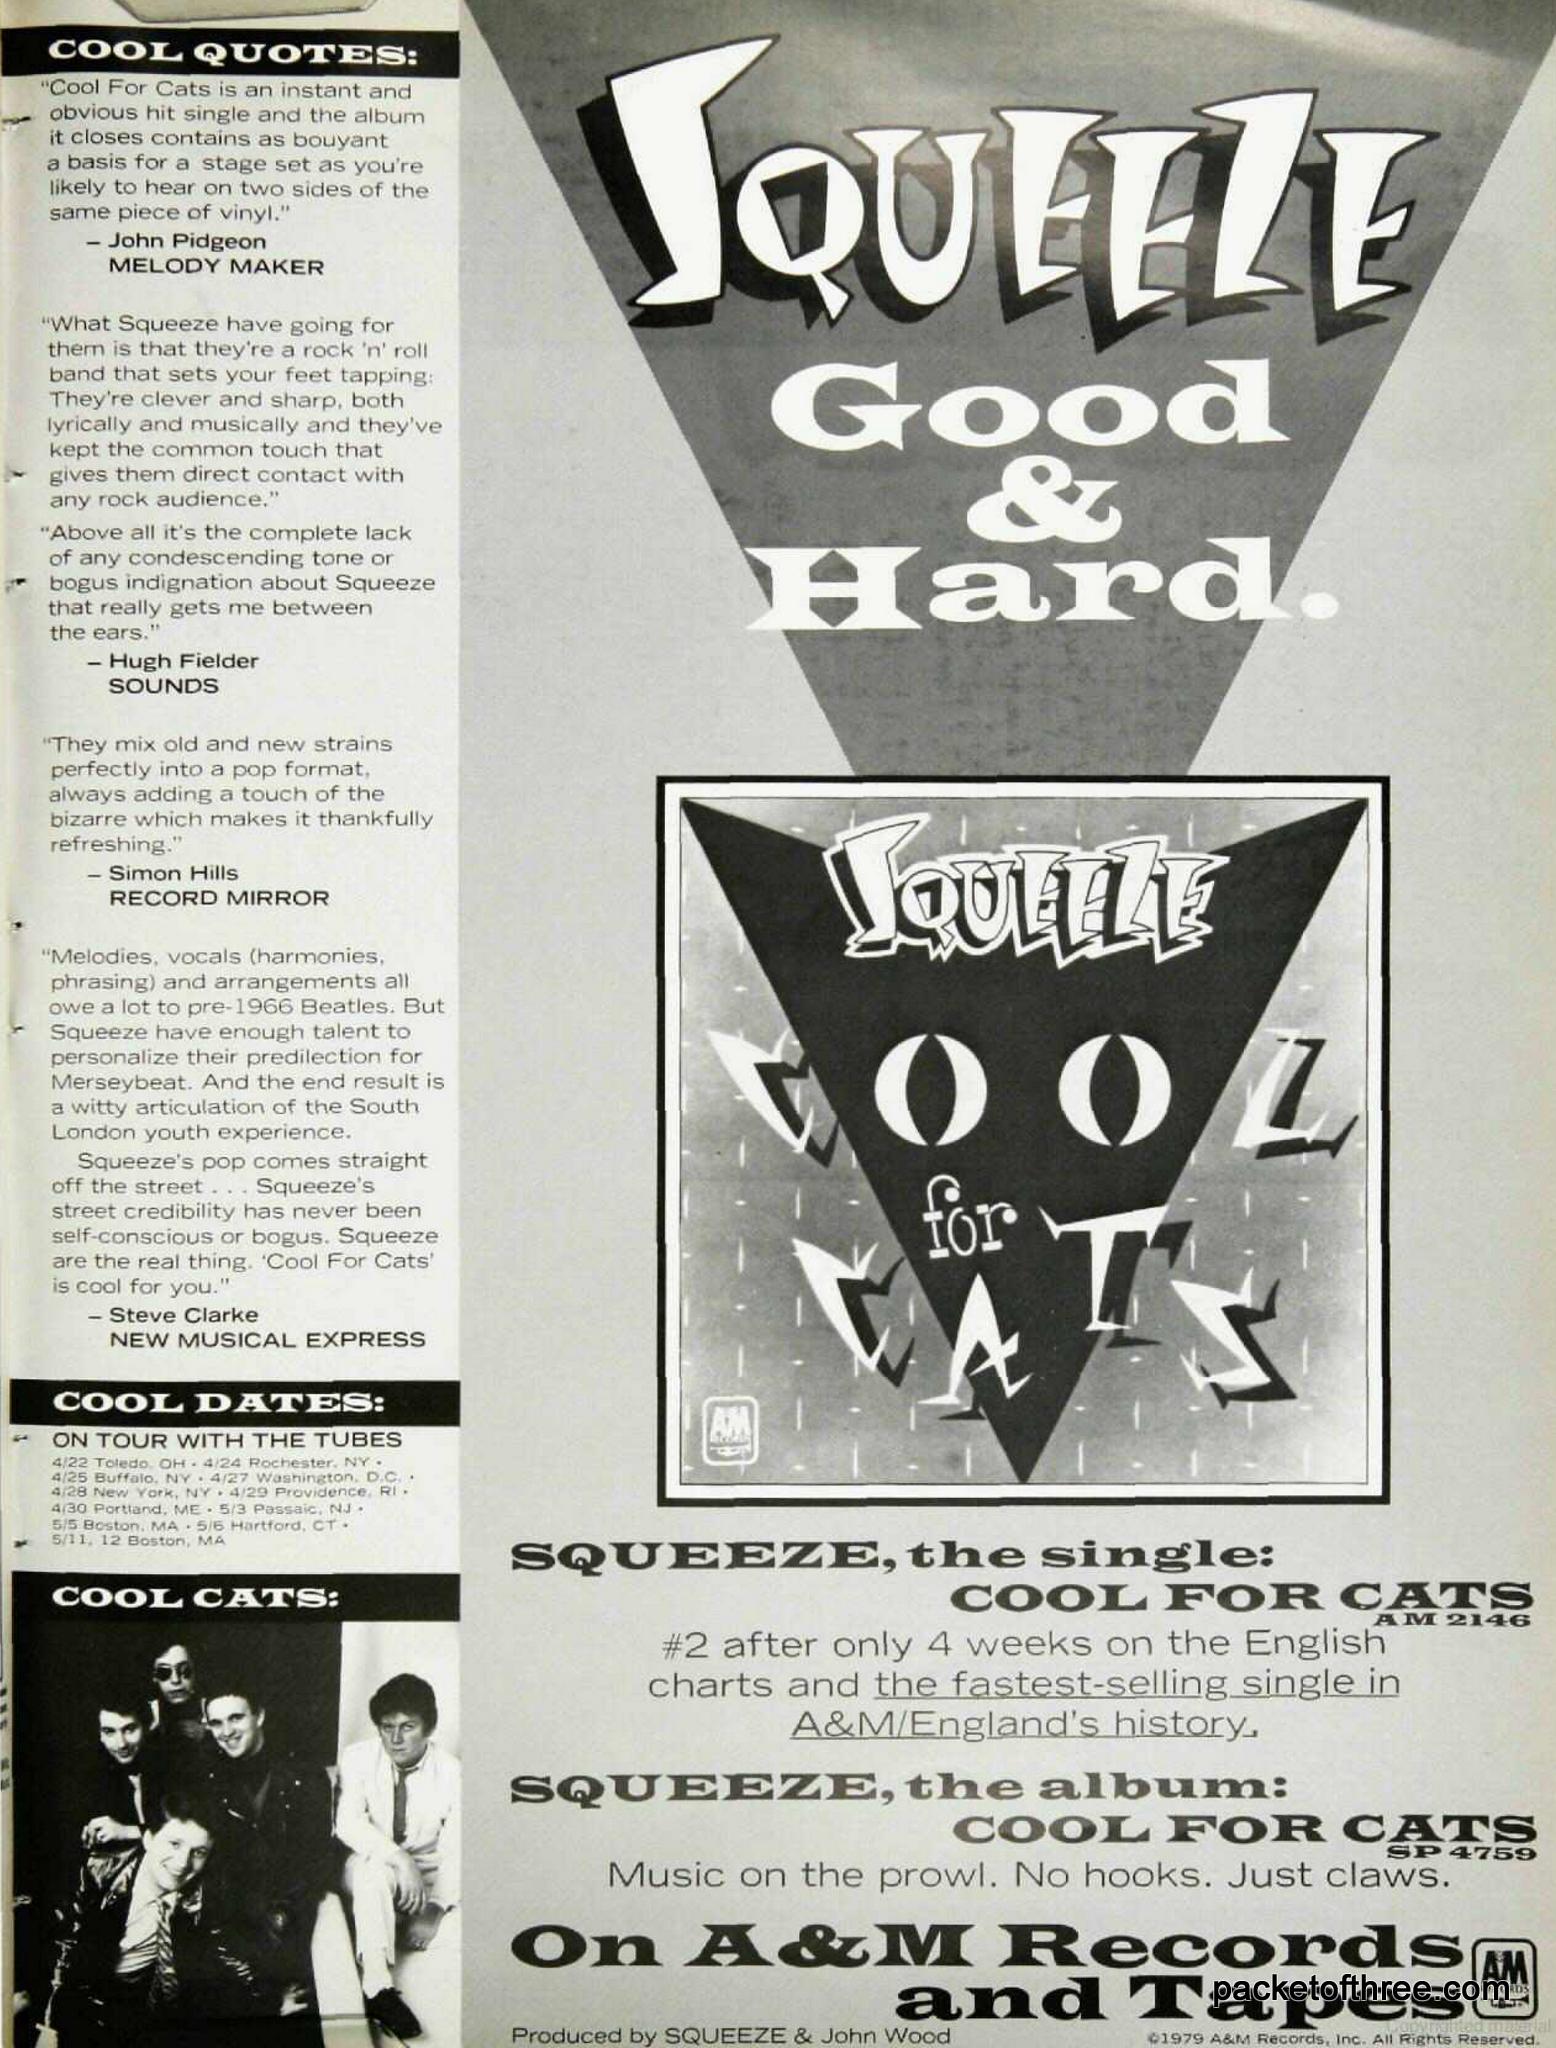 USA Tour ad 1979